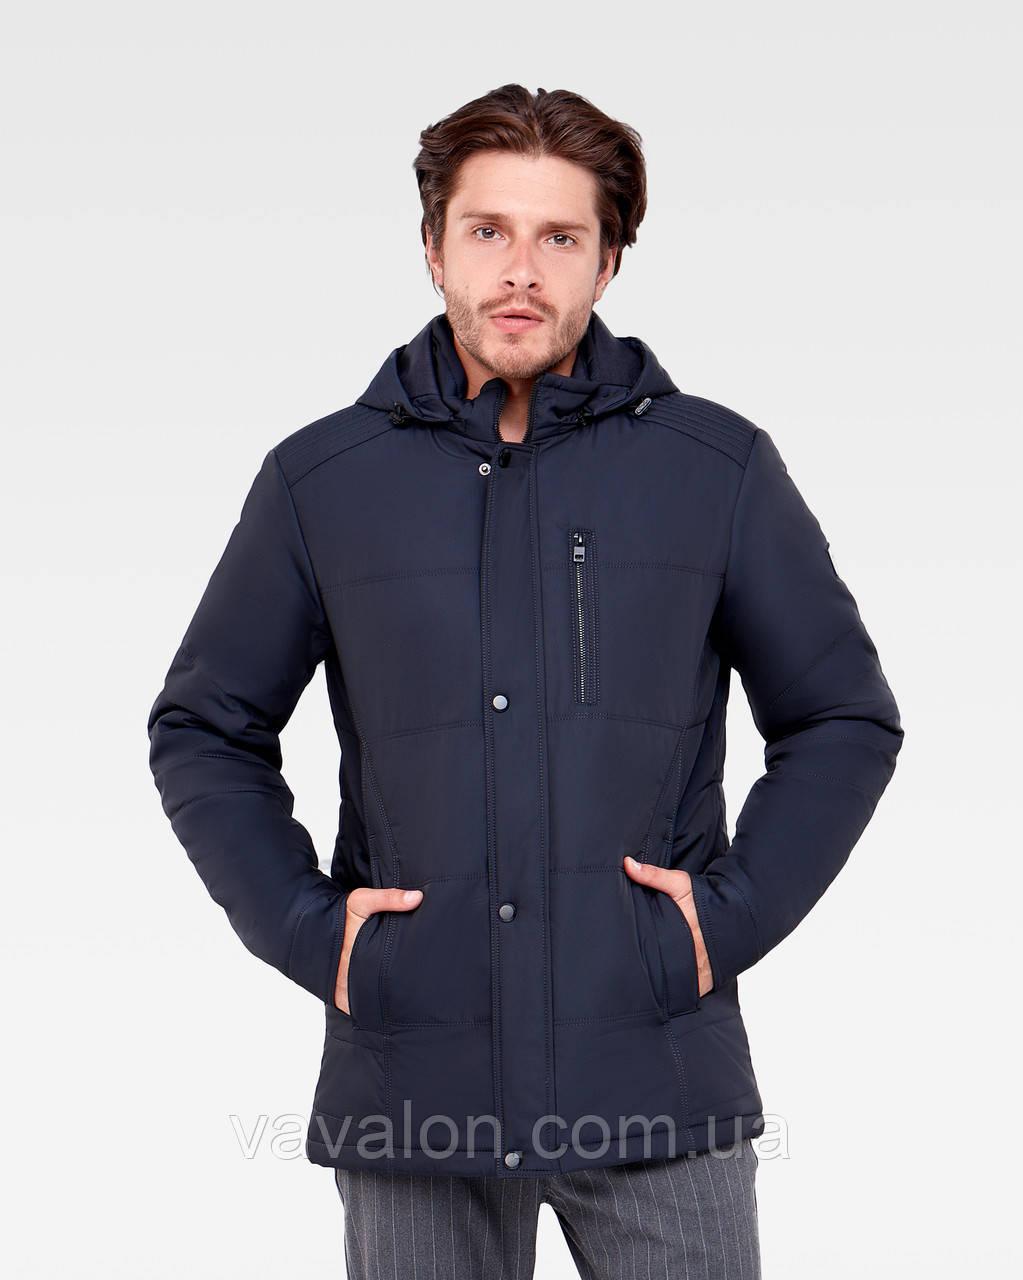 Куртка демисезонная Vavalon KD-906 navy